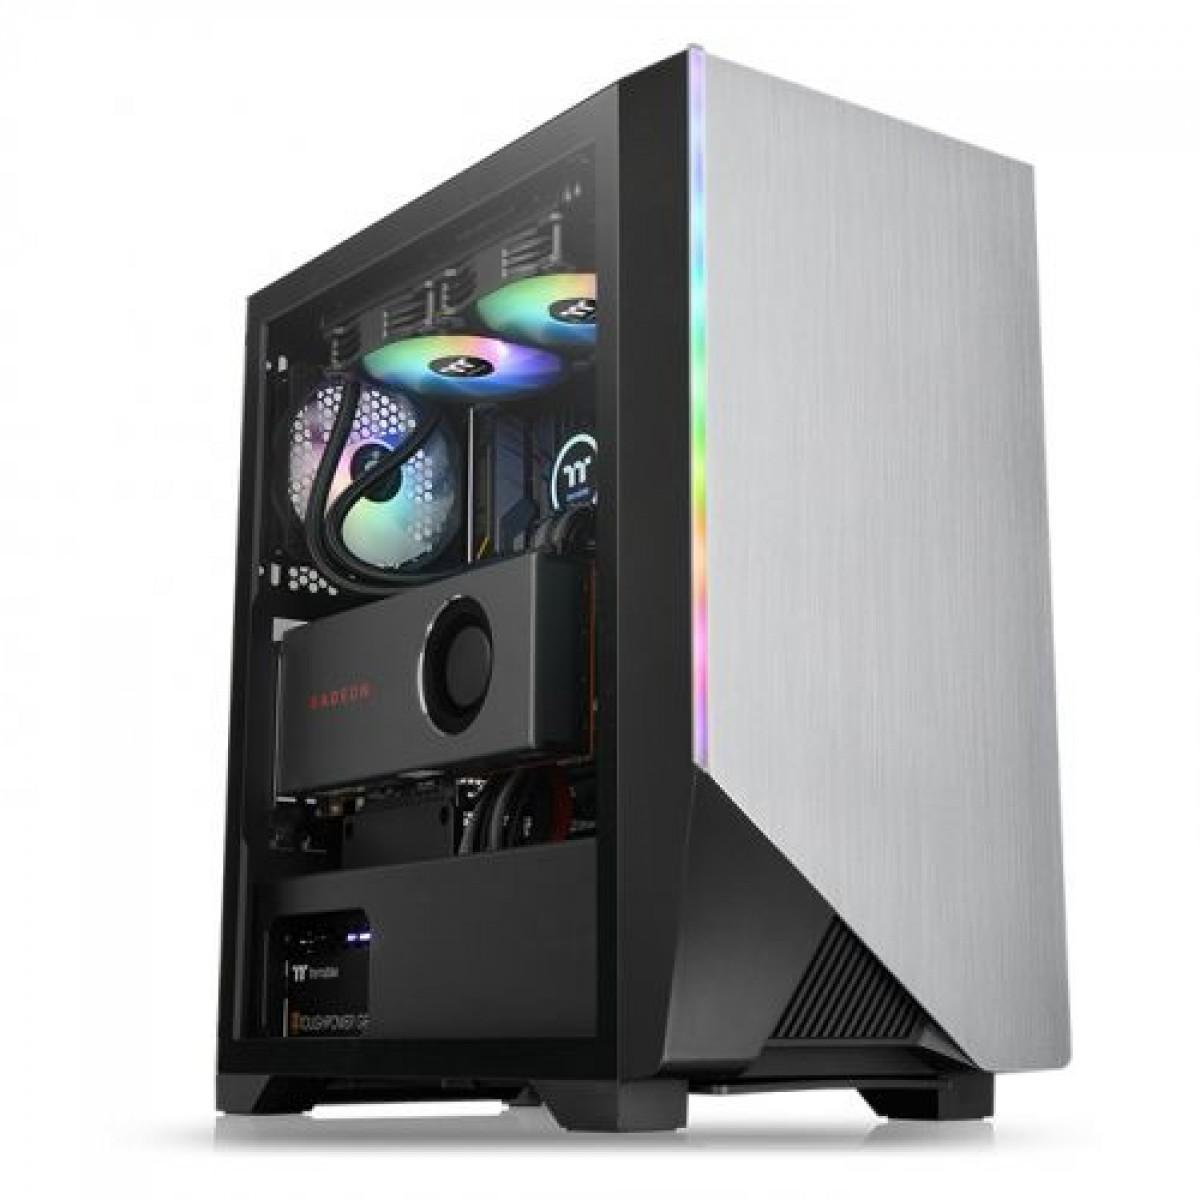 Gabinete Gamer Thermaltake H550 TG, ARGB, Mid Tower, Vidro Temperado, Black, Com 1 Fans, Sem Fonte, CA-1P4-00M1WN-00